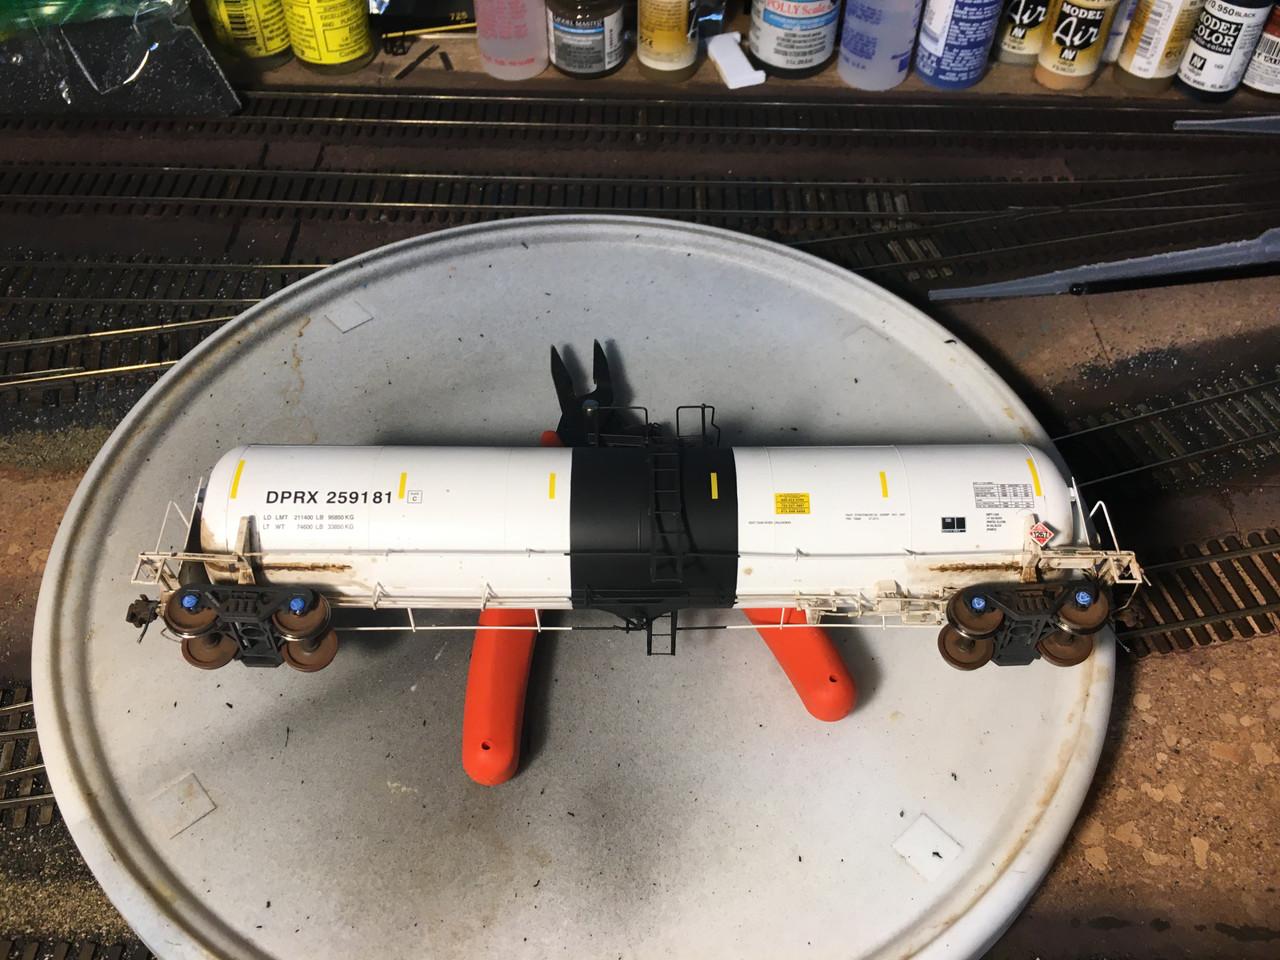 Scaletrains {SXT31653} Custom Weathered Trinity 31k Gallon Crude Oil - Deep Rock Refining Co. DRPX #259181 (Scale=HO) Part#8003-SXT31653w